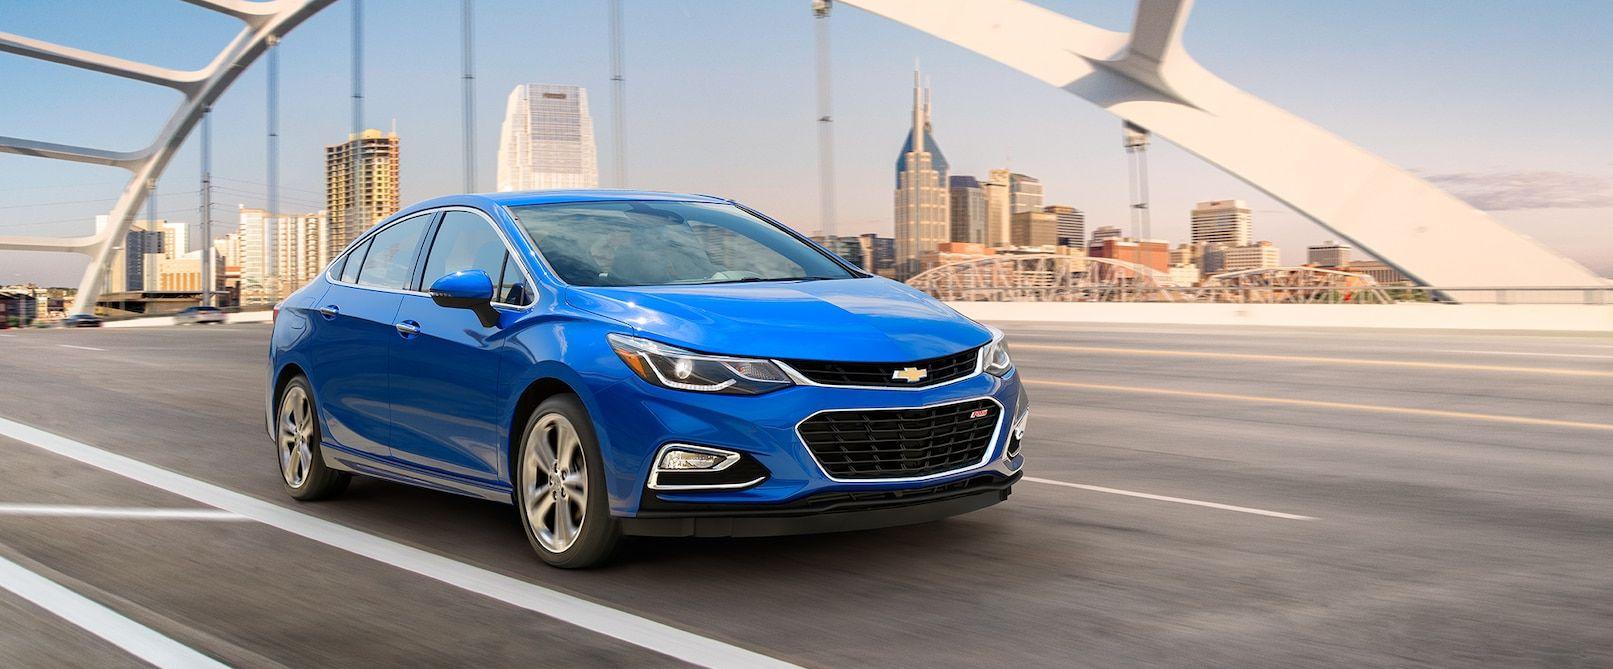 Chevrolet Cruze Owners Manual: Roadside Assistance Program